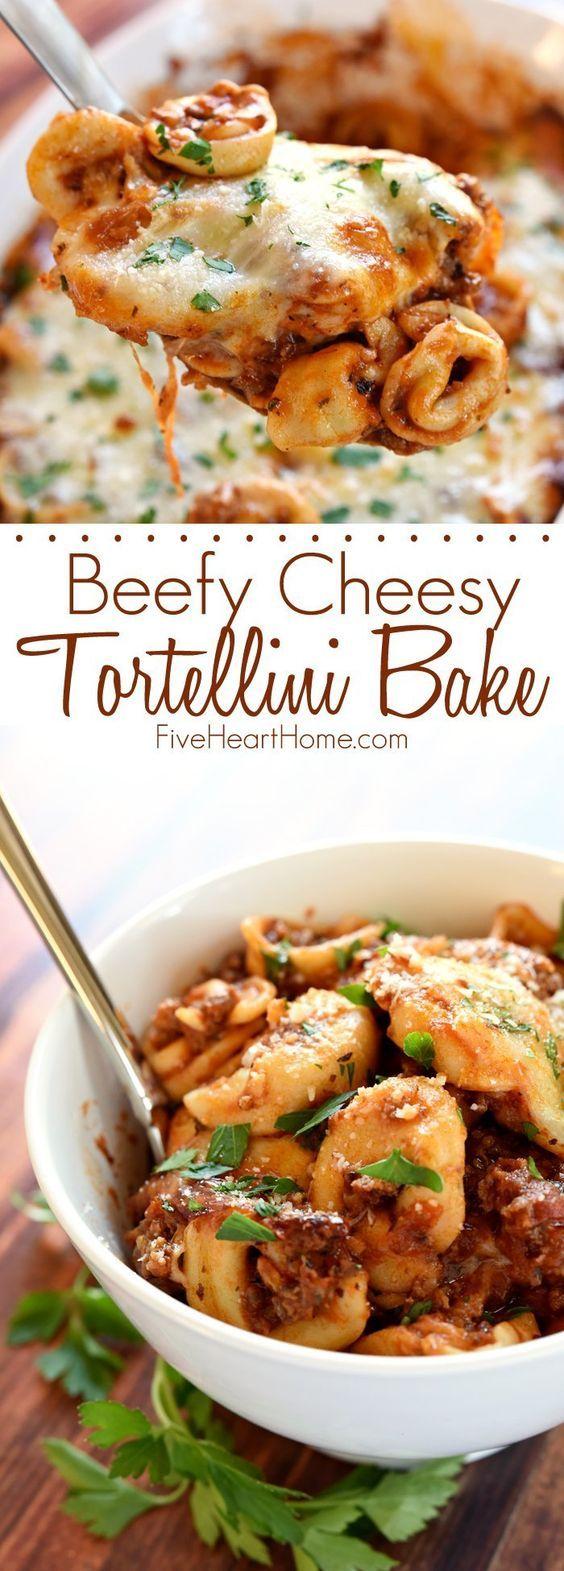 Beefy Cheesy Tortellini Bake FoodBlogs.com